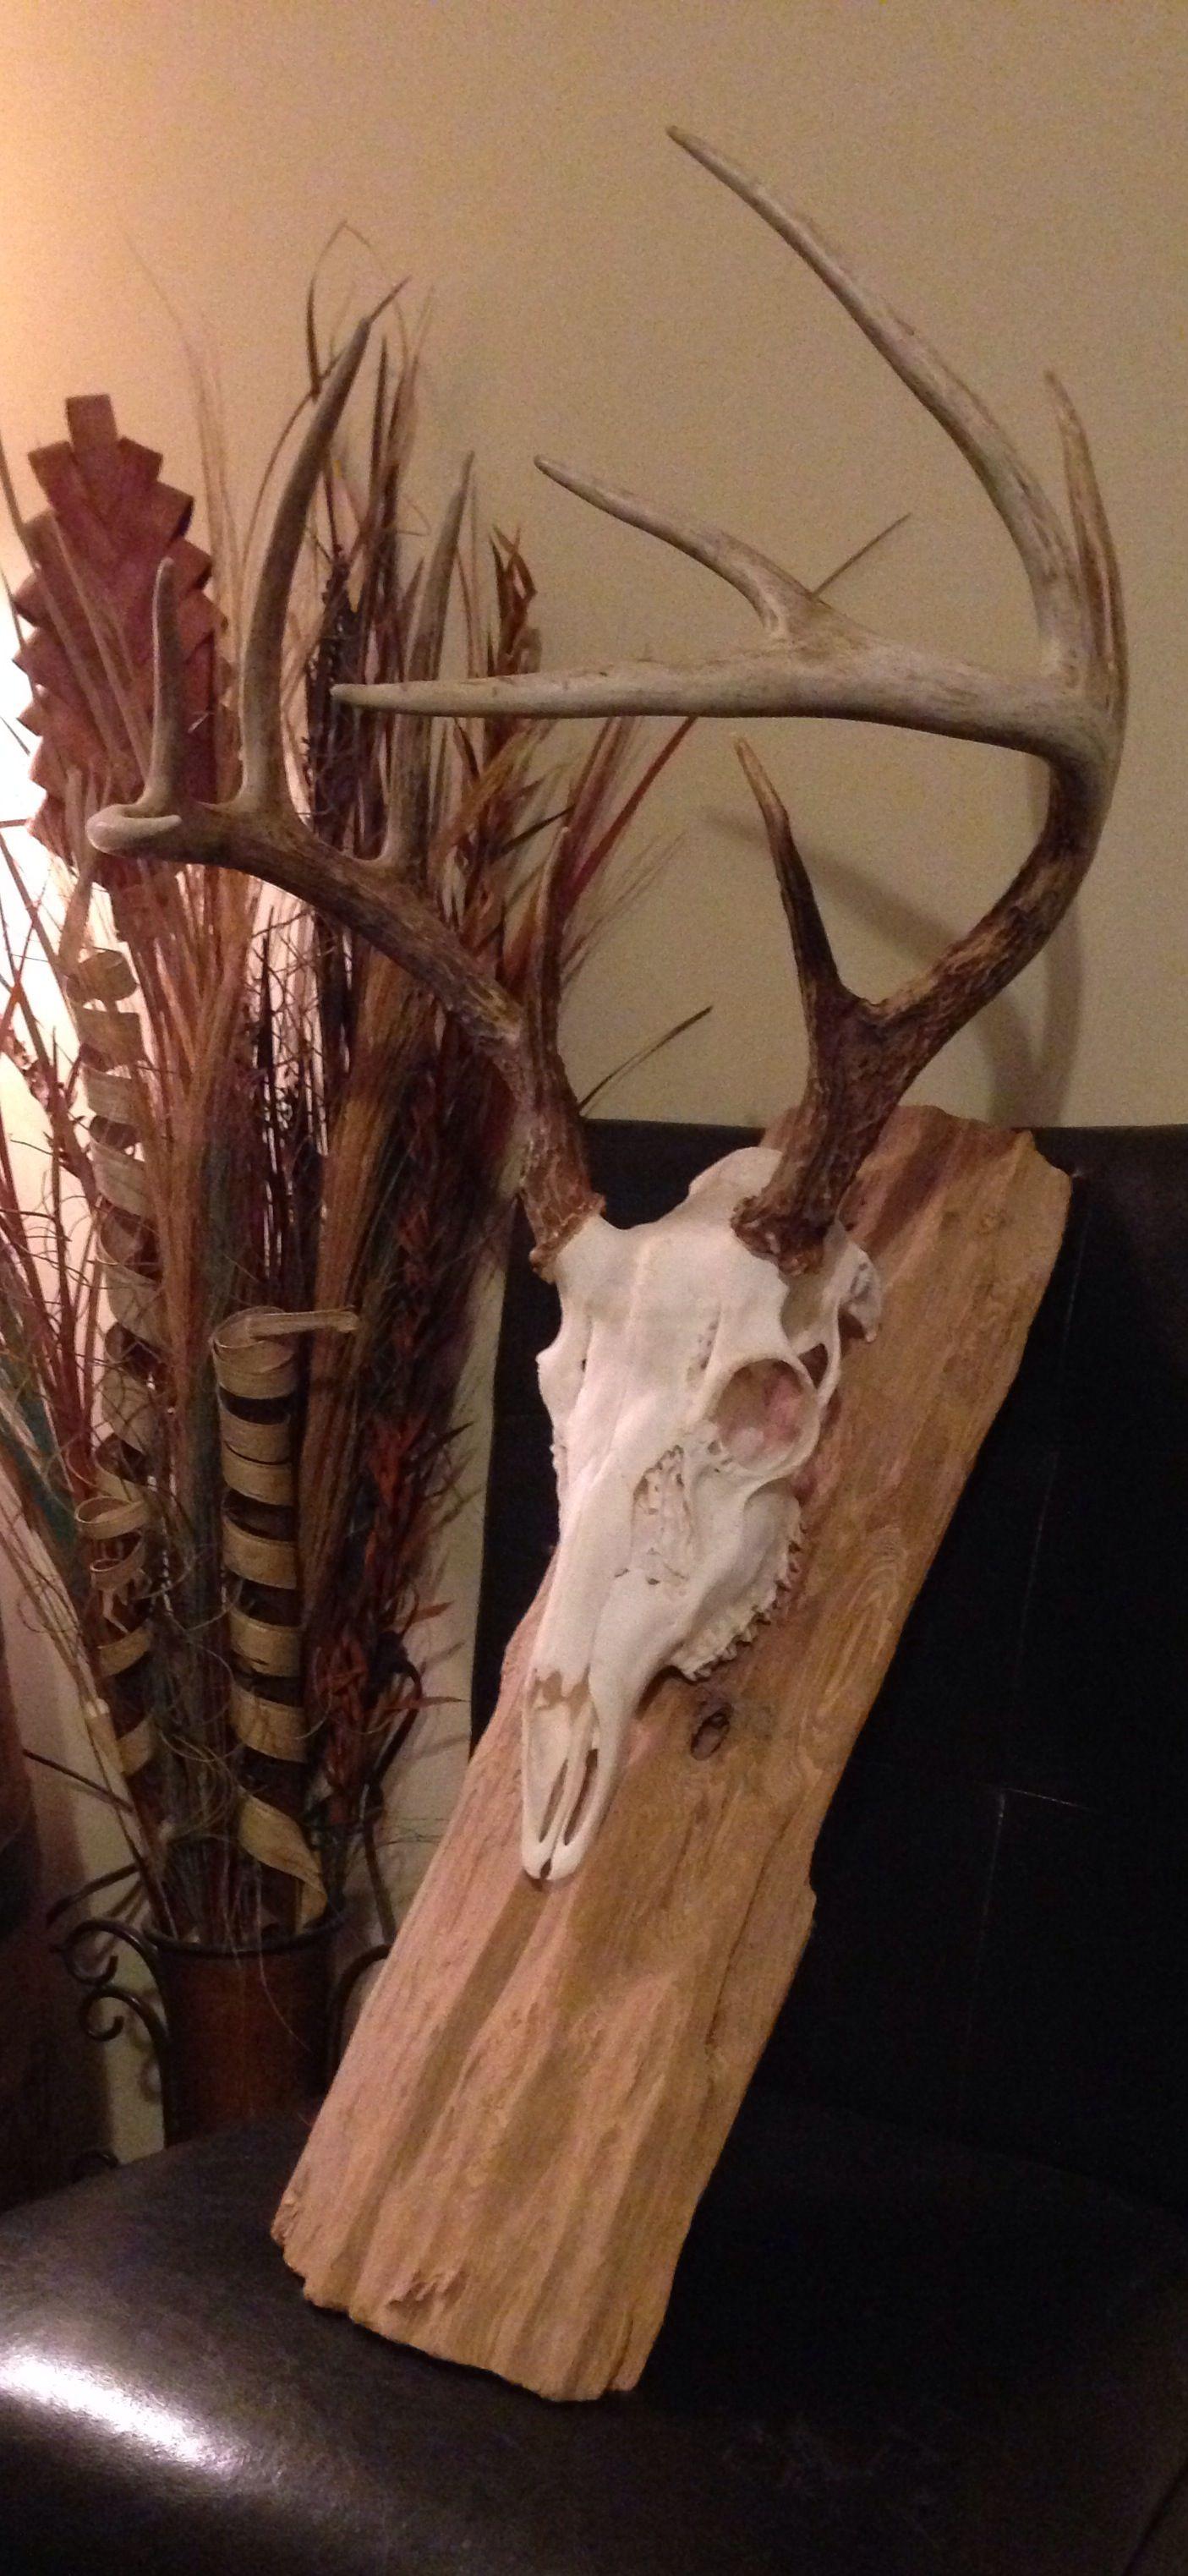 Deer skull mount ideas - Whitetail Deer European Mount On Drift Wood